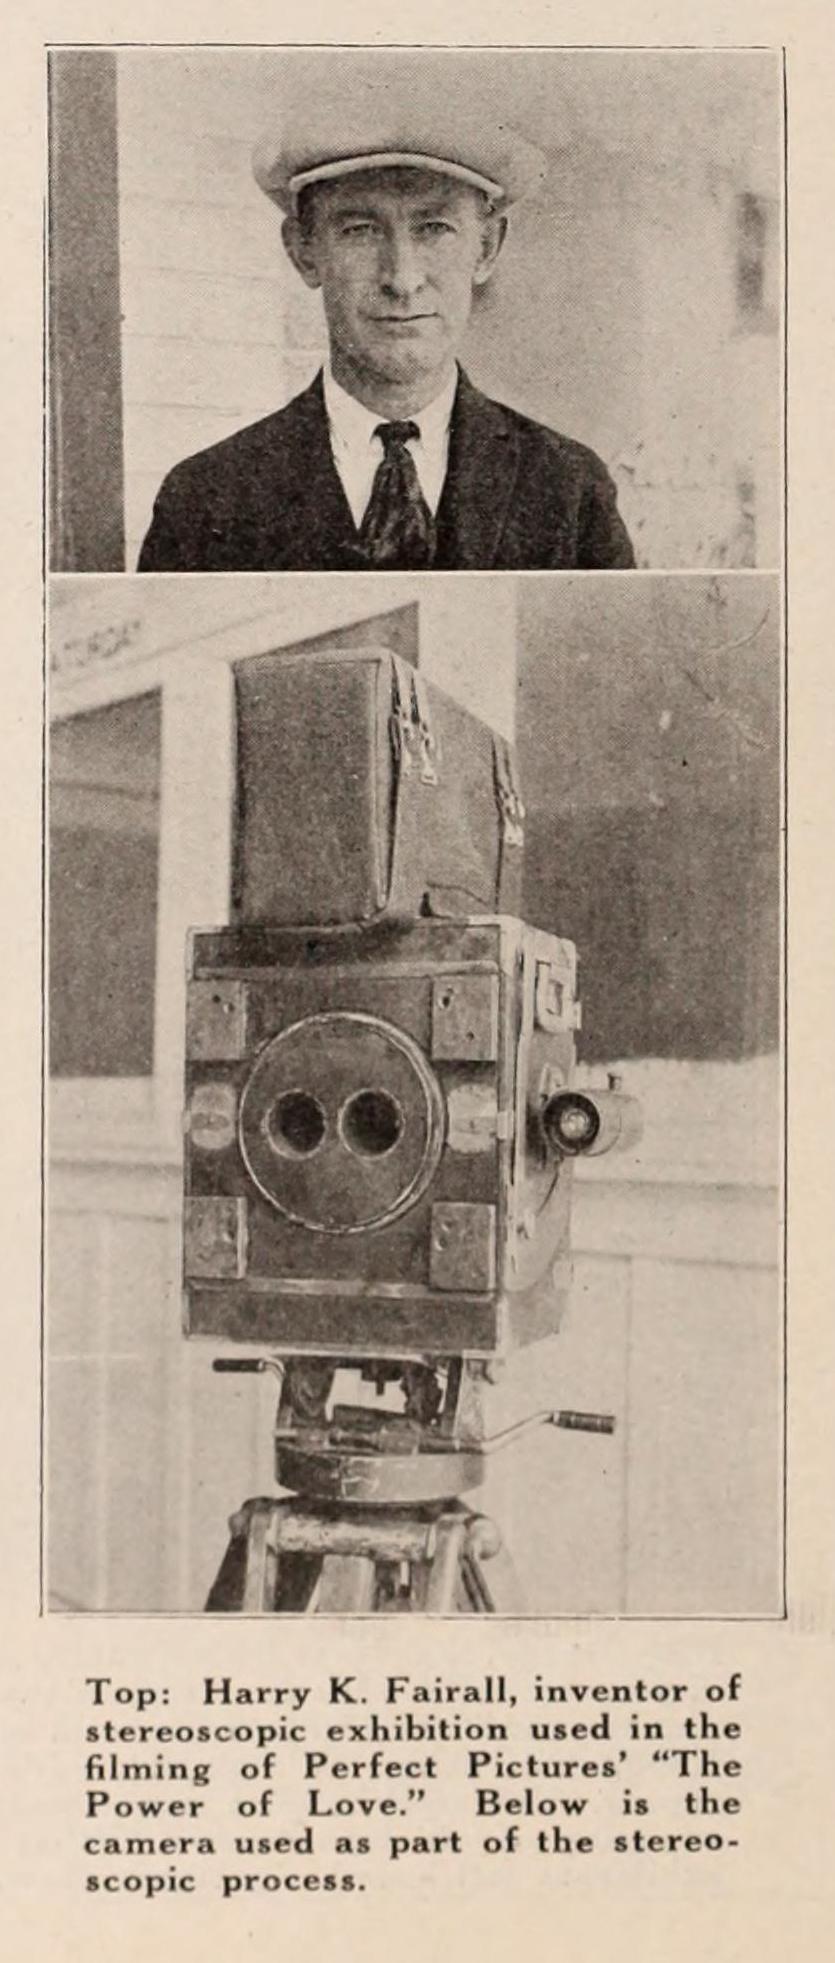 File:Harry Fairall and stereoscopic camera jpg - Wikimedia